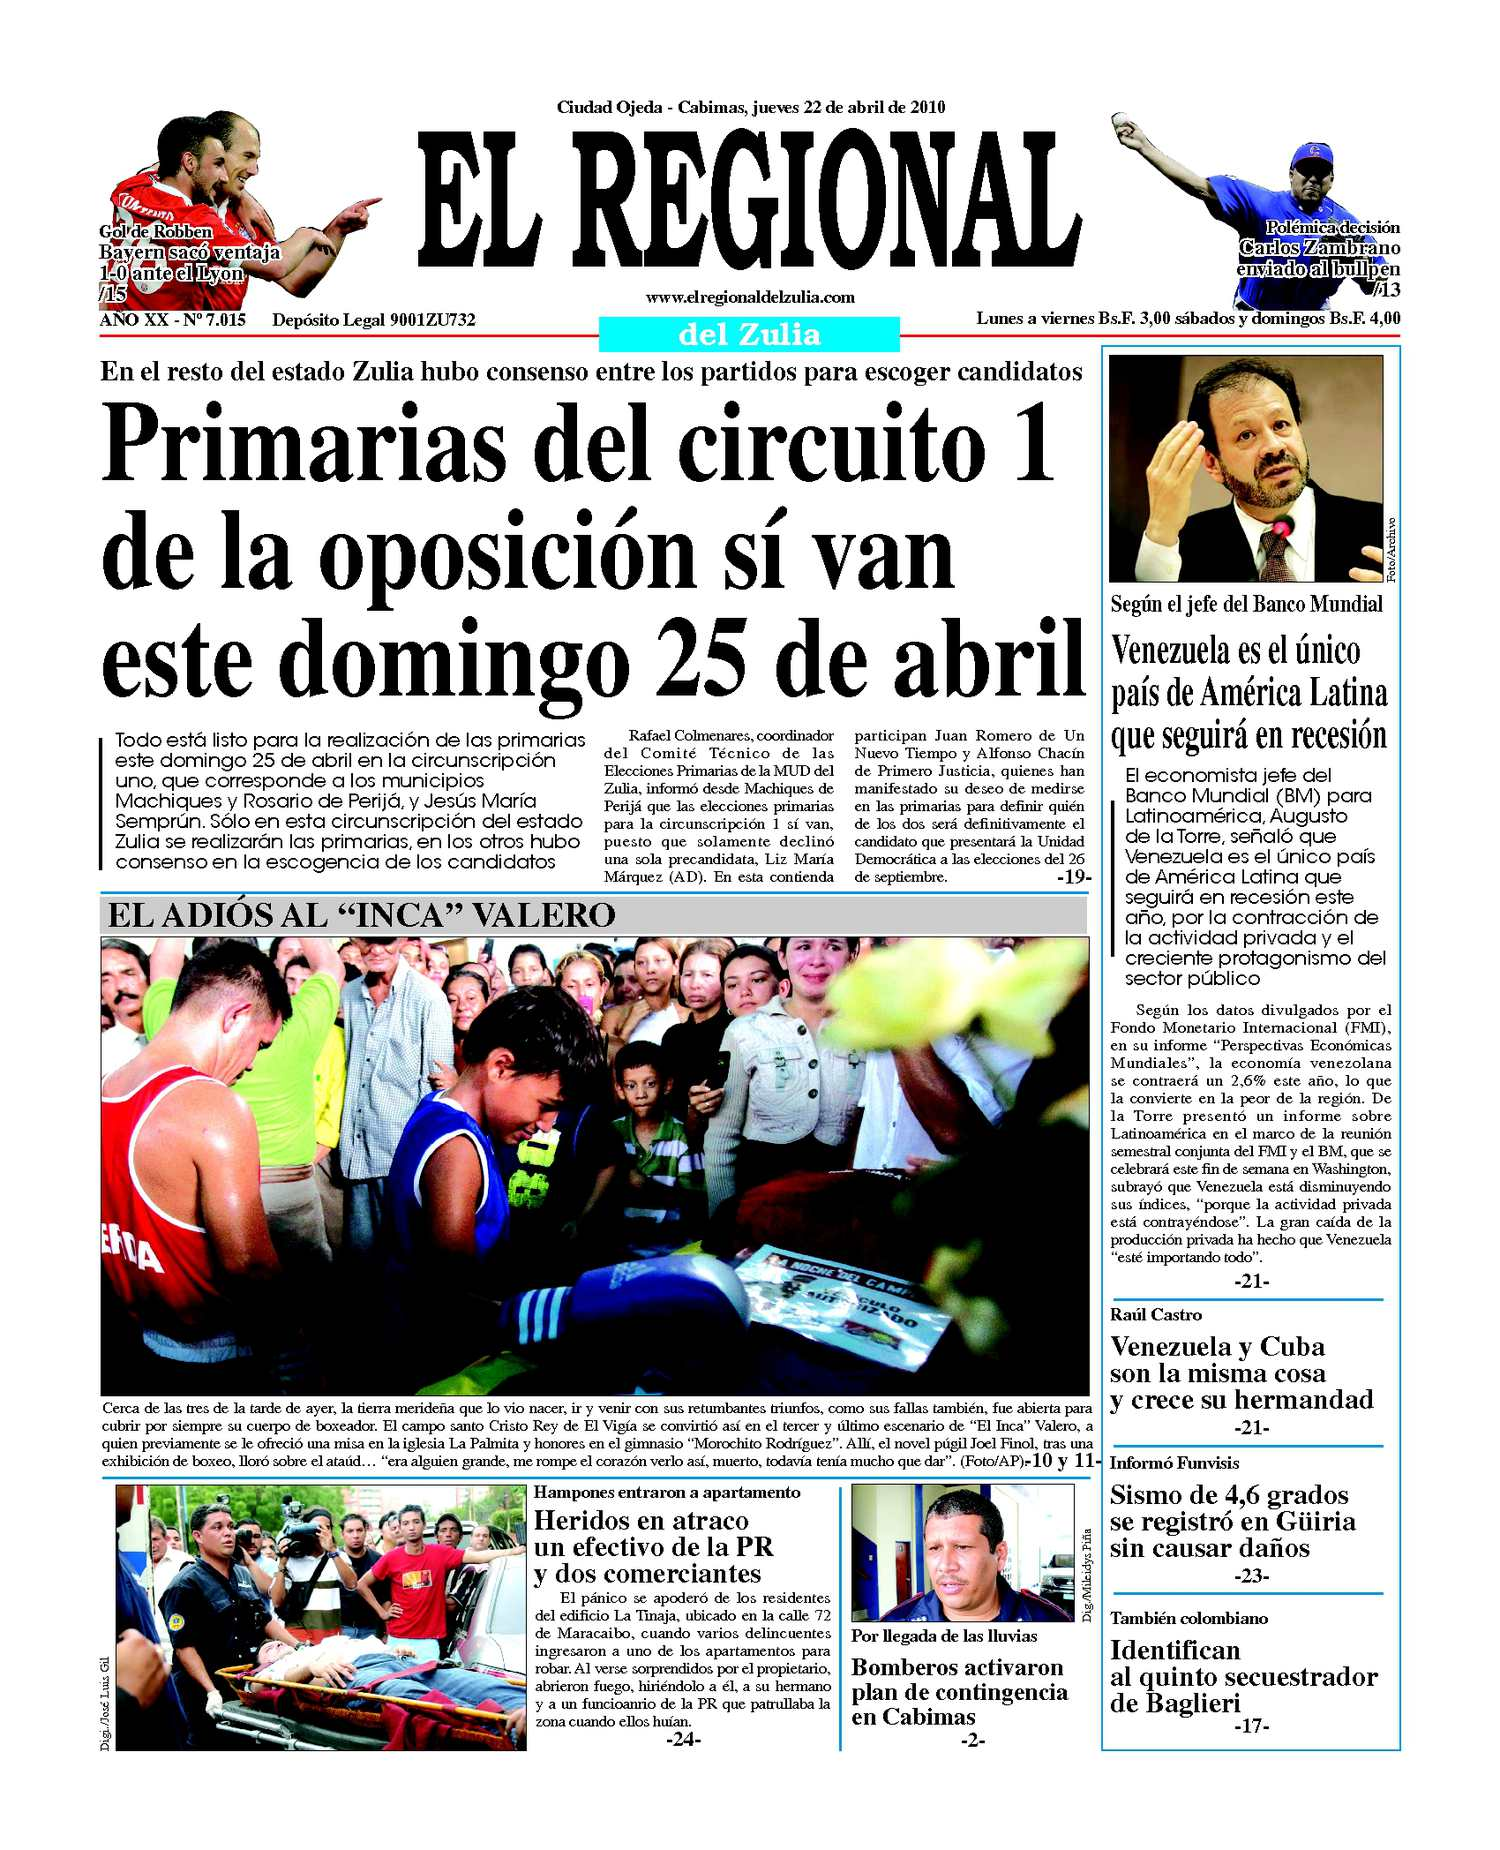 El Regional del Zuia 22-04-2010